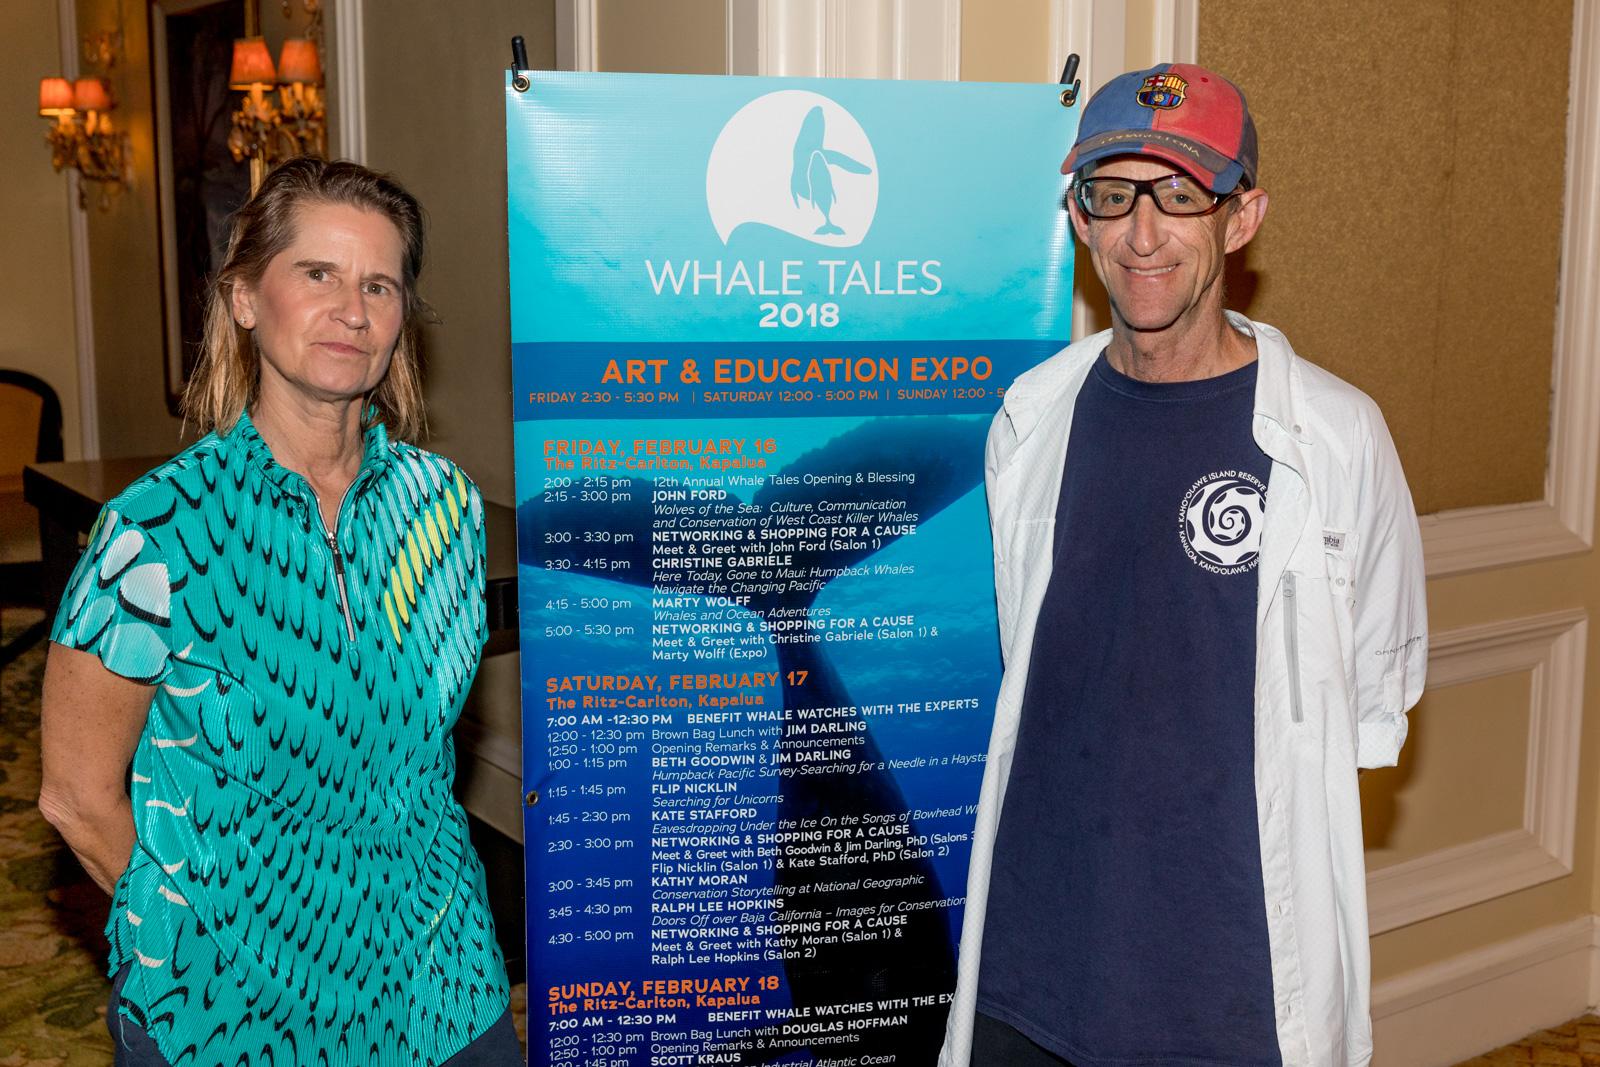 WhaleTales_2018-749_web_berkowitz